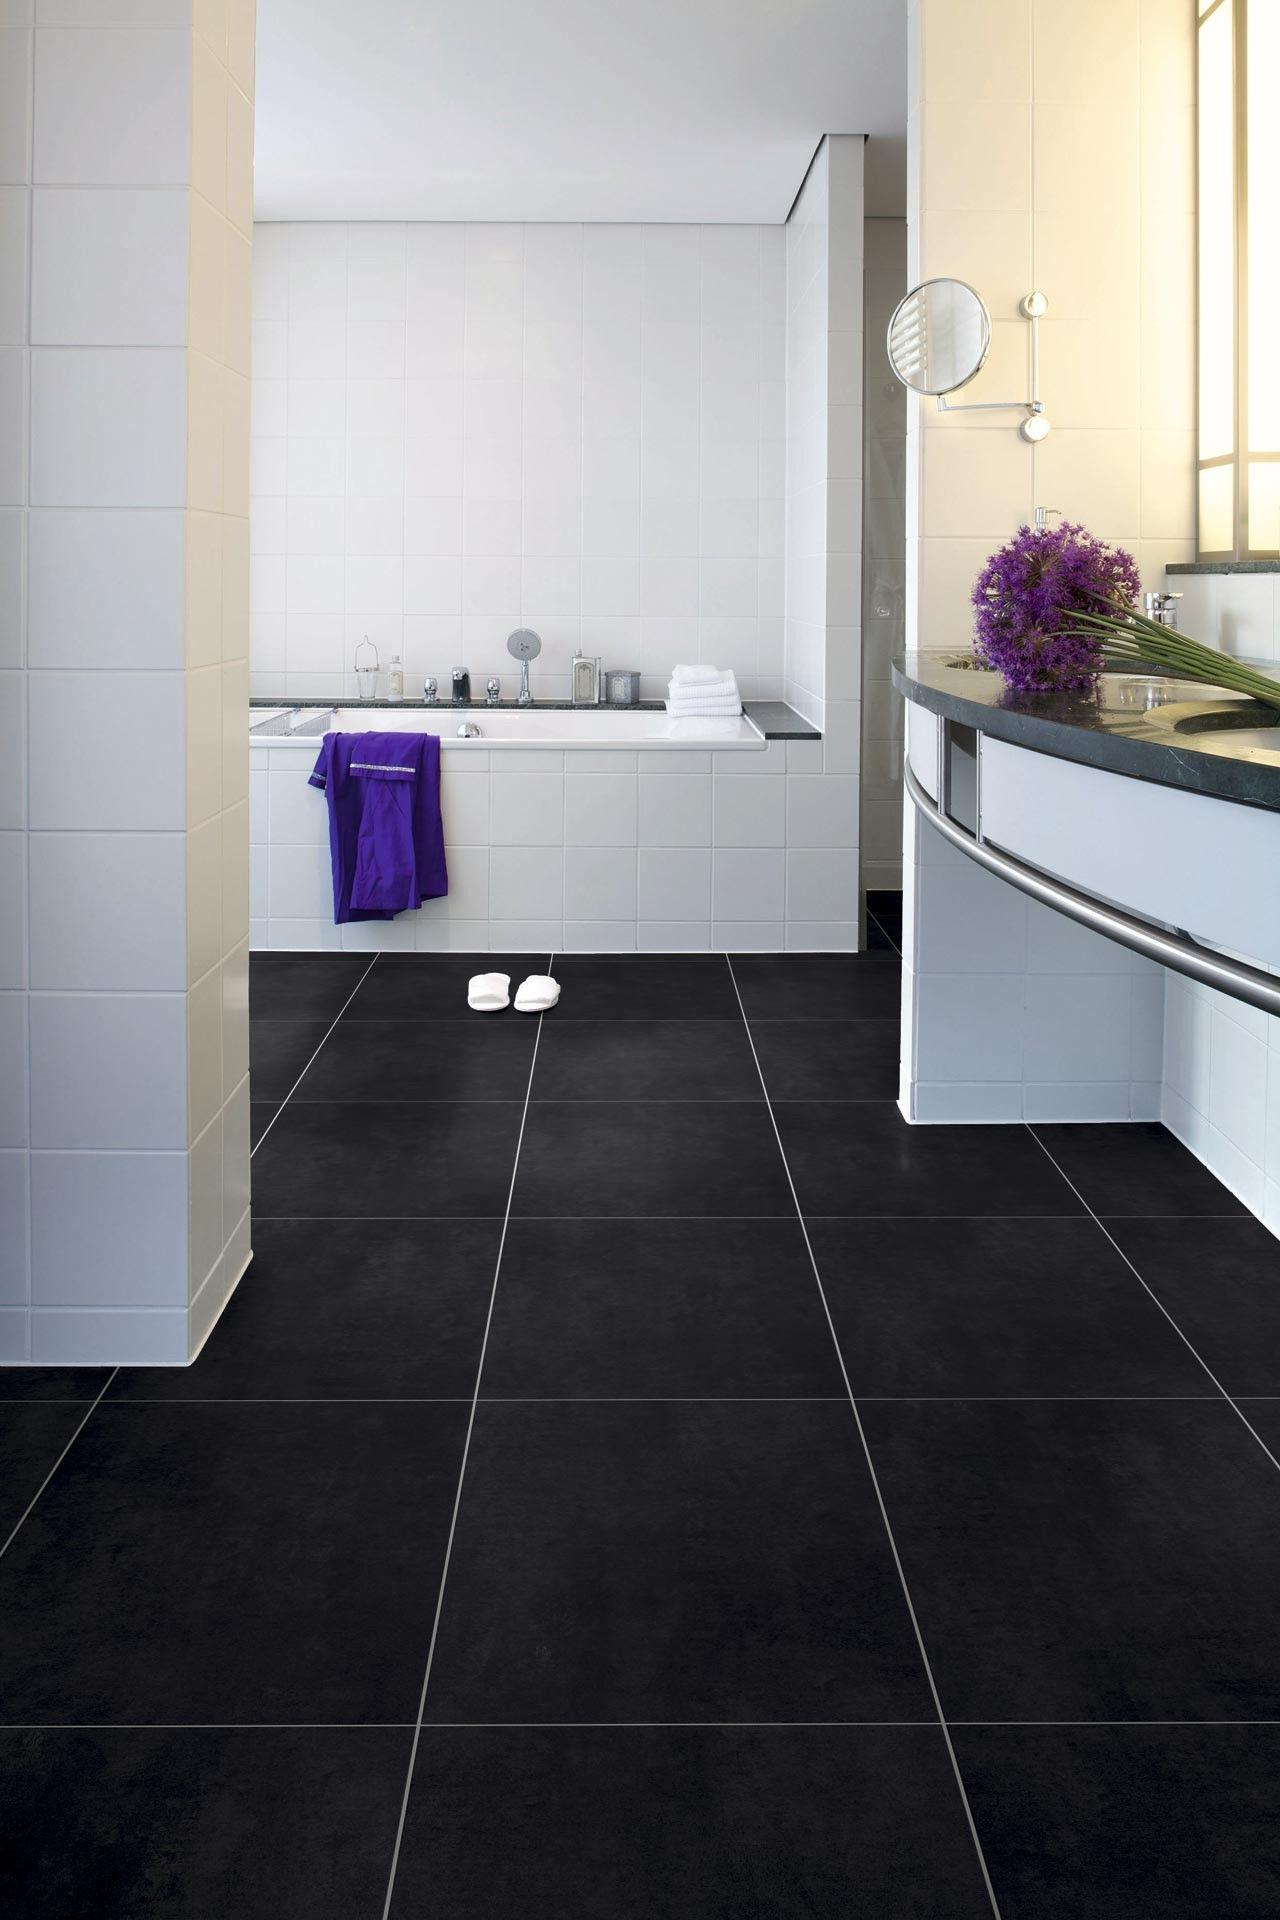 Mitte jahrhundert badezimmer design mooie tegels  badkamer ideeen  pinterest